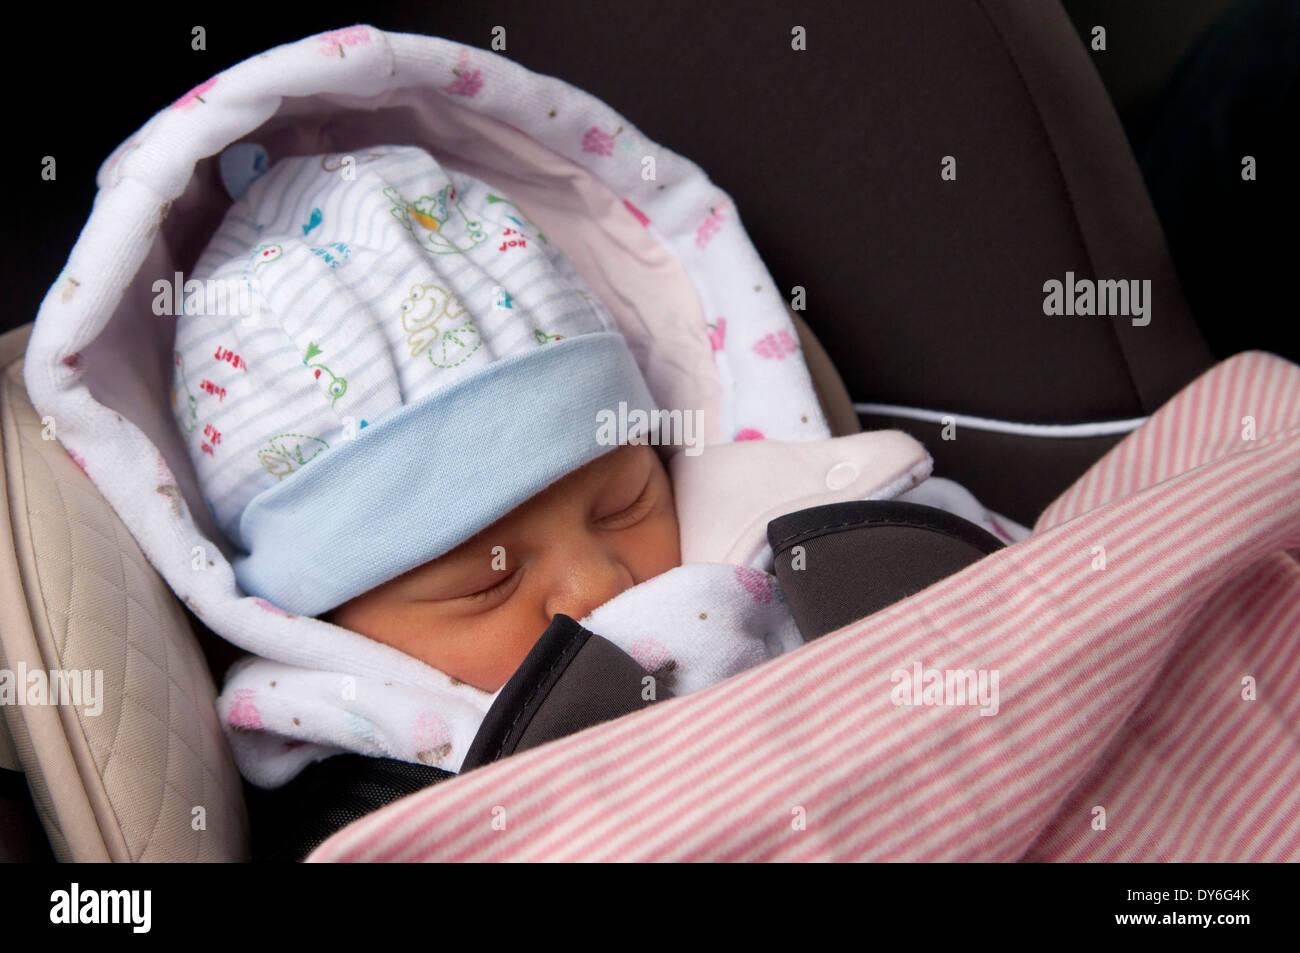 Newborn Baby Girl Day Old Asleep Car Seat Leaving